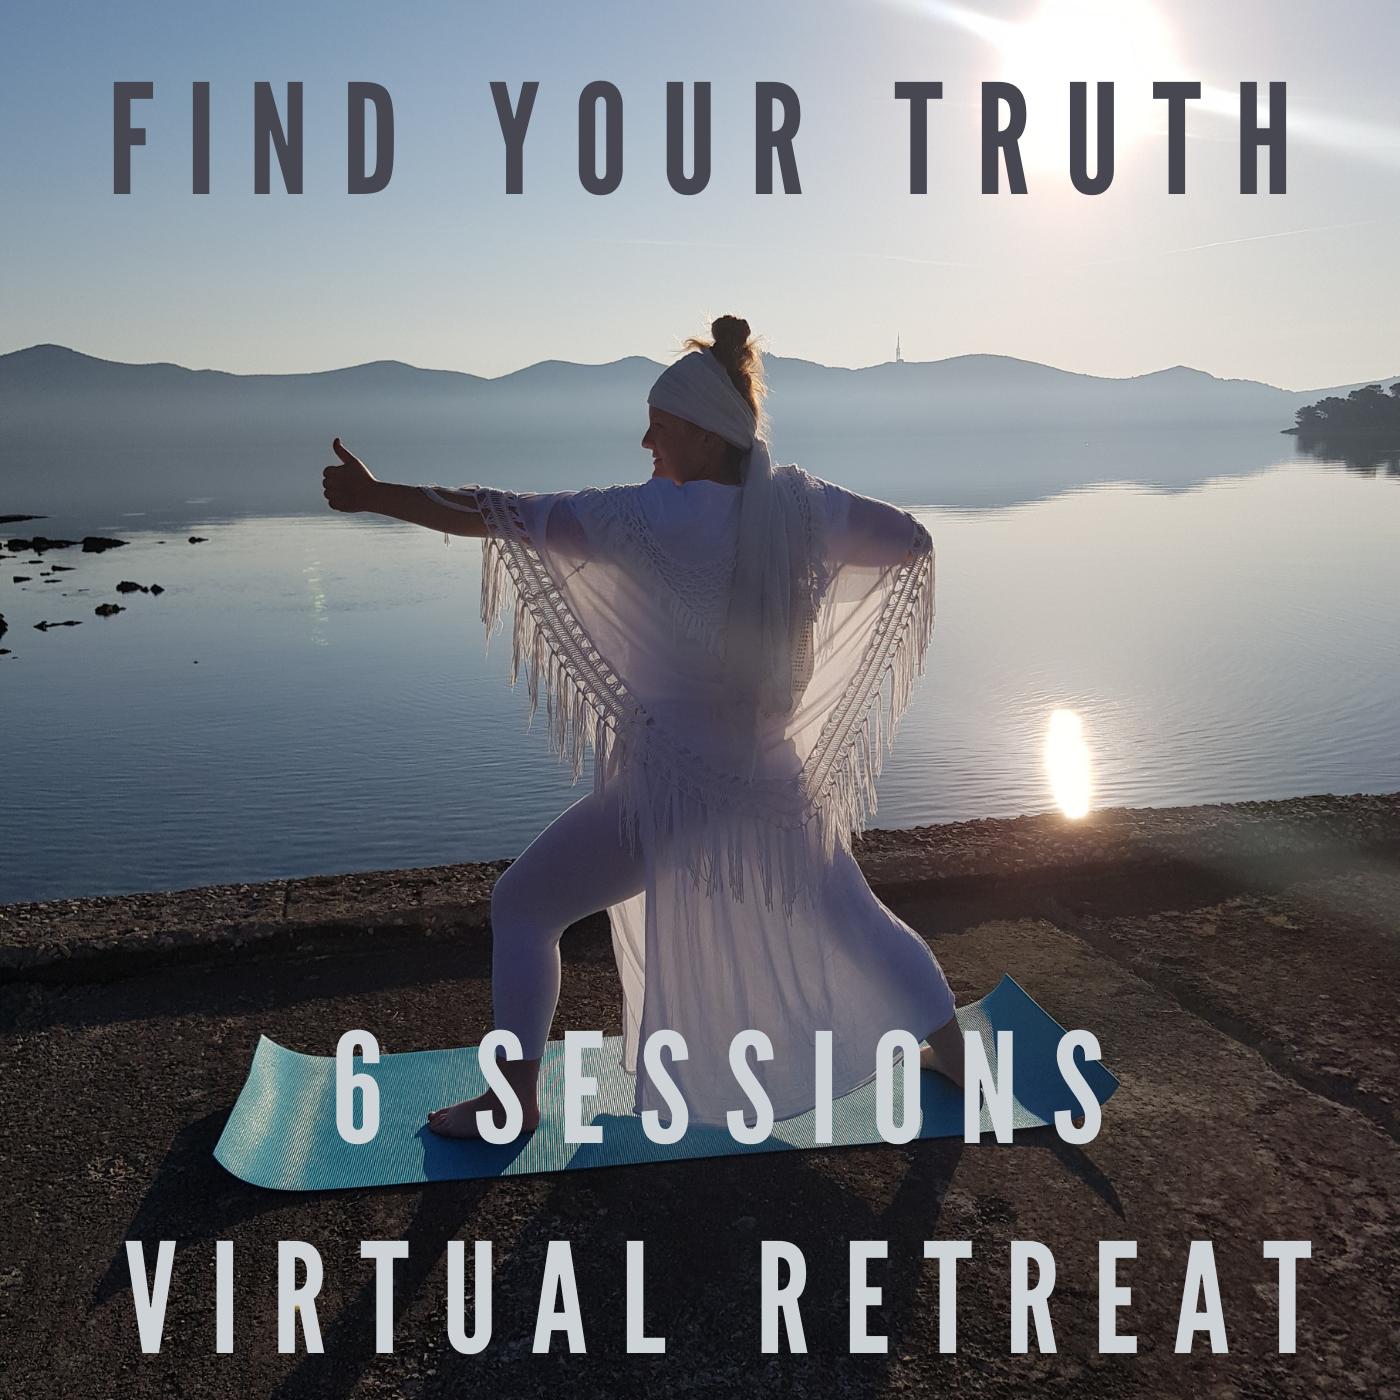 Find YOUR Truth - Kundalini Yoga Virtual Retreat Experience